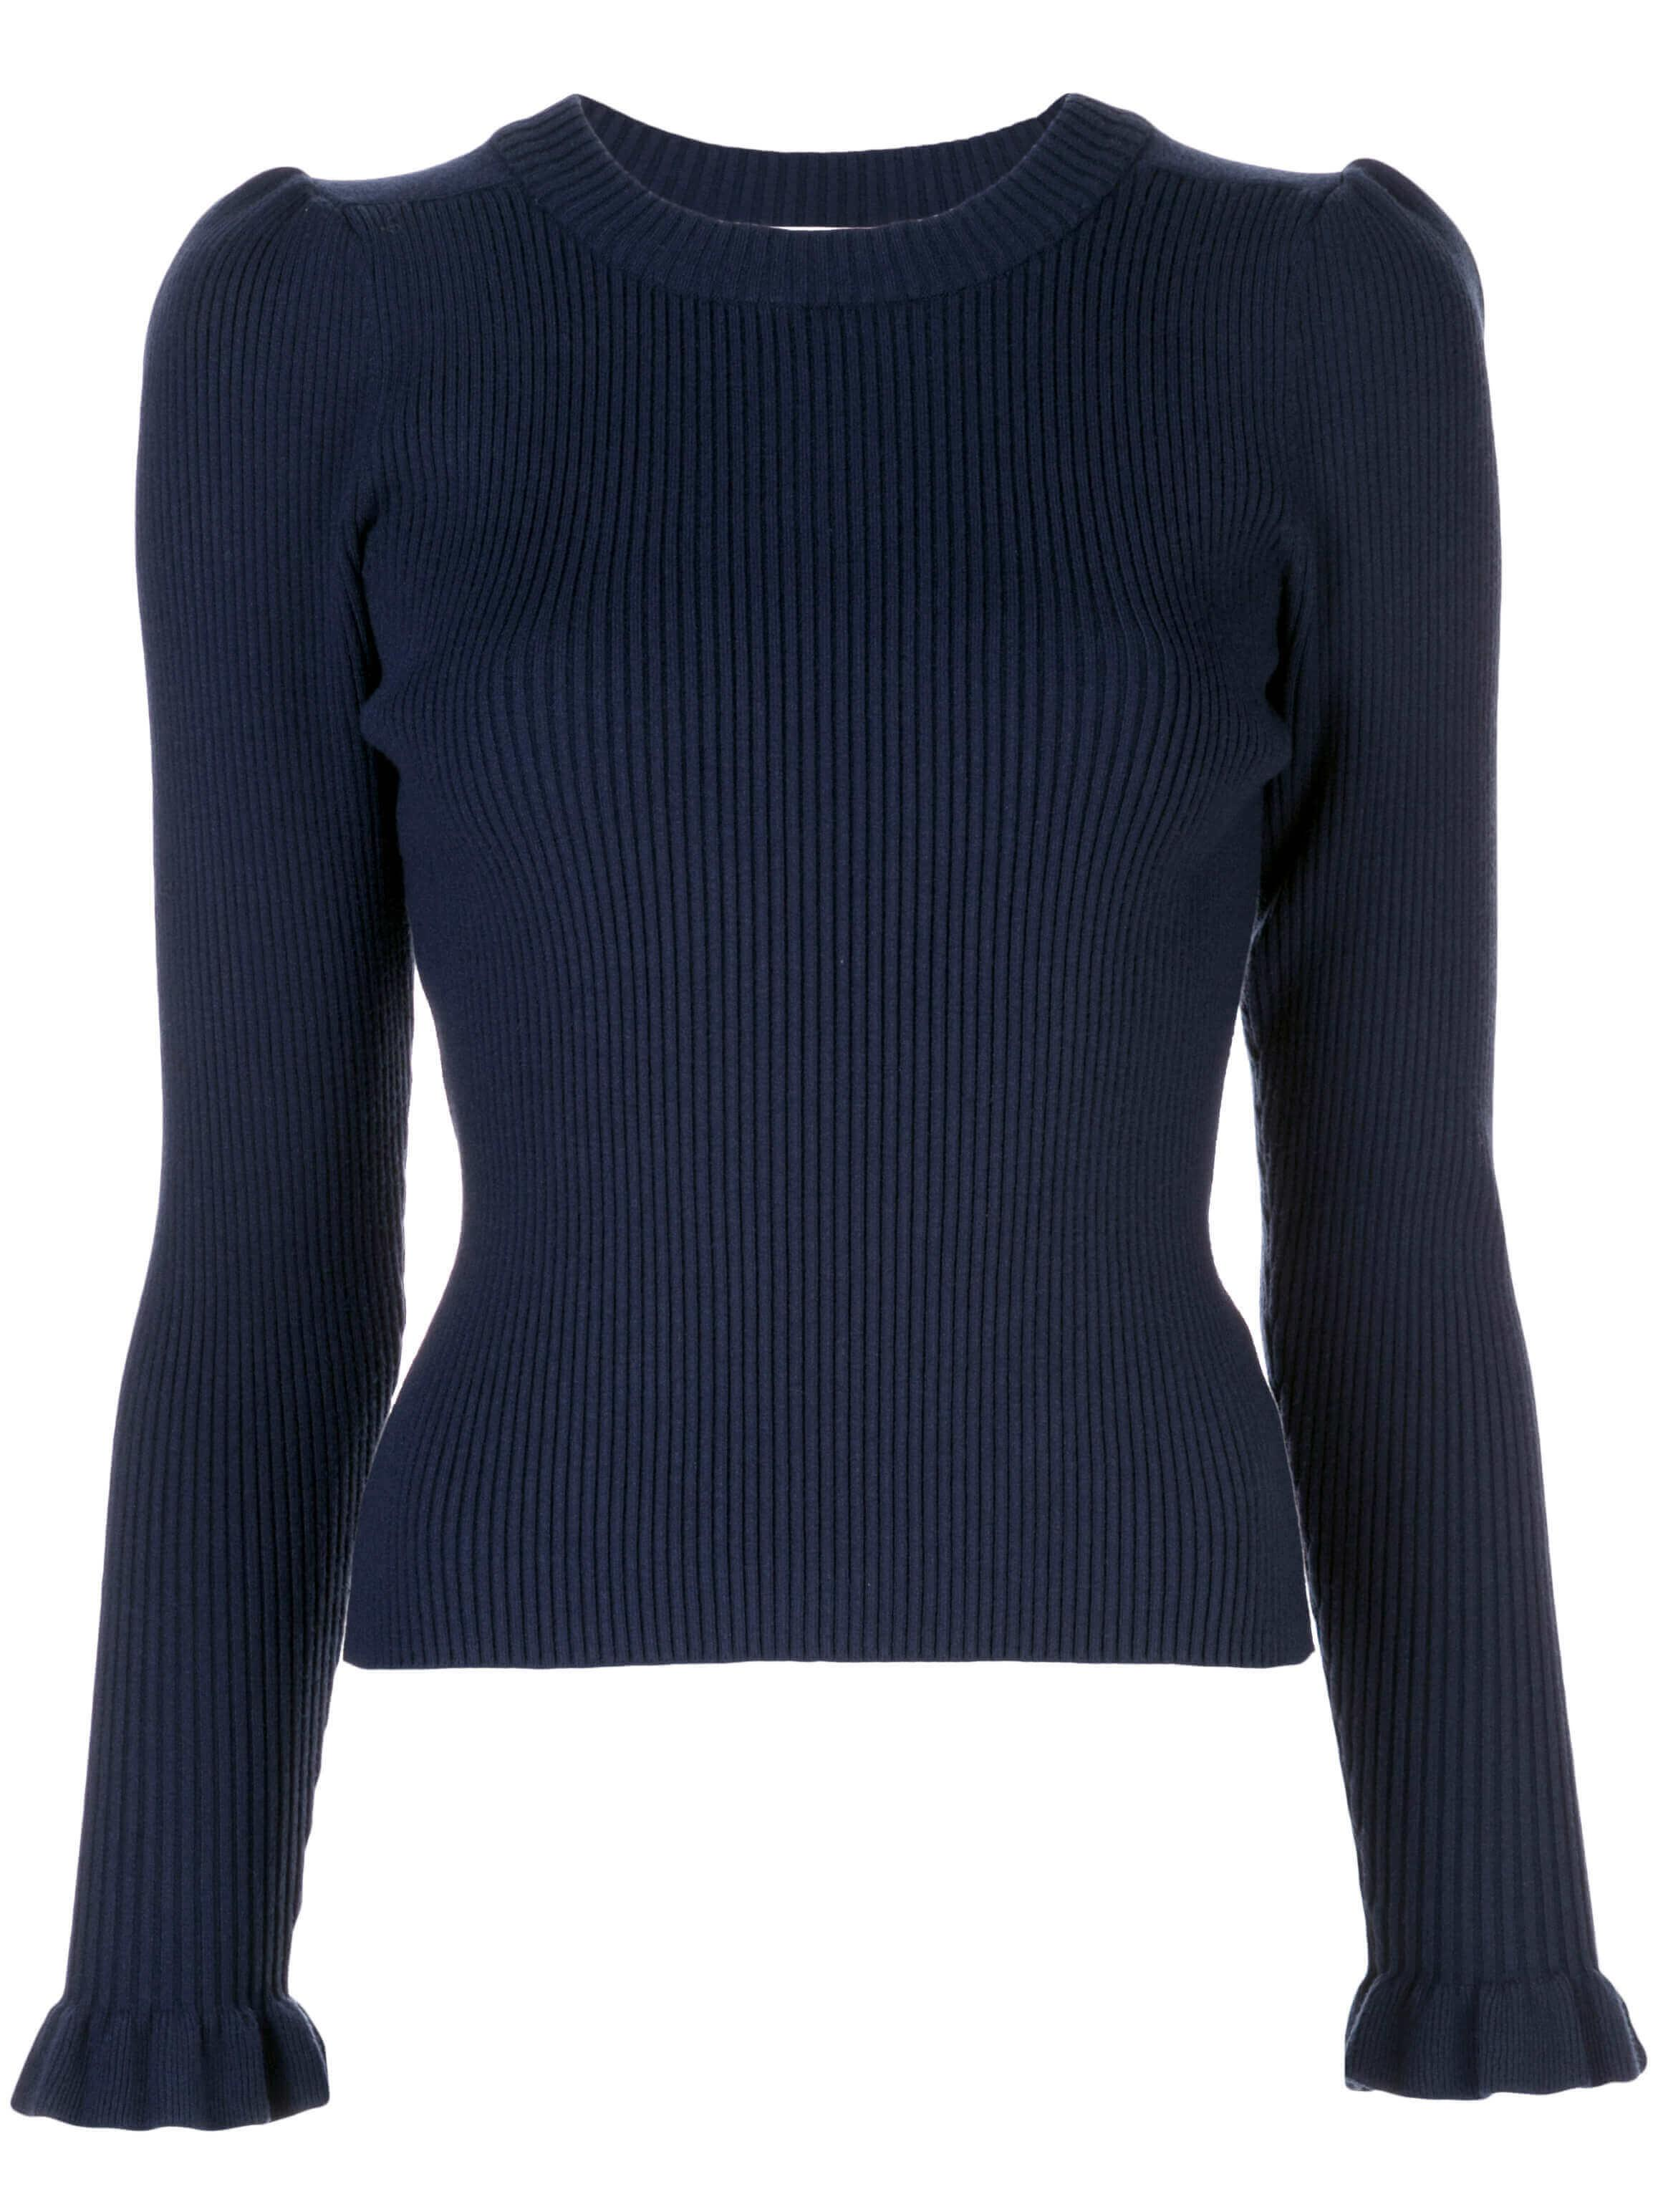 Ruffle Cuff Rib Cream Neck Long Sleeve Sweater